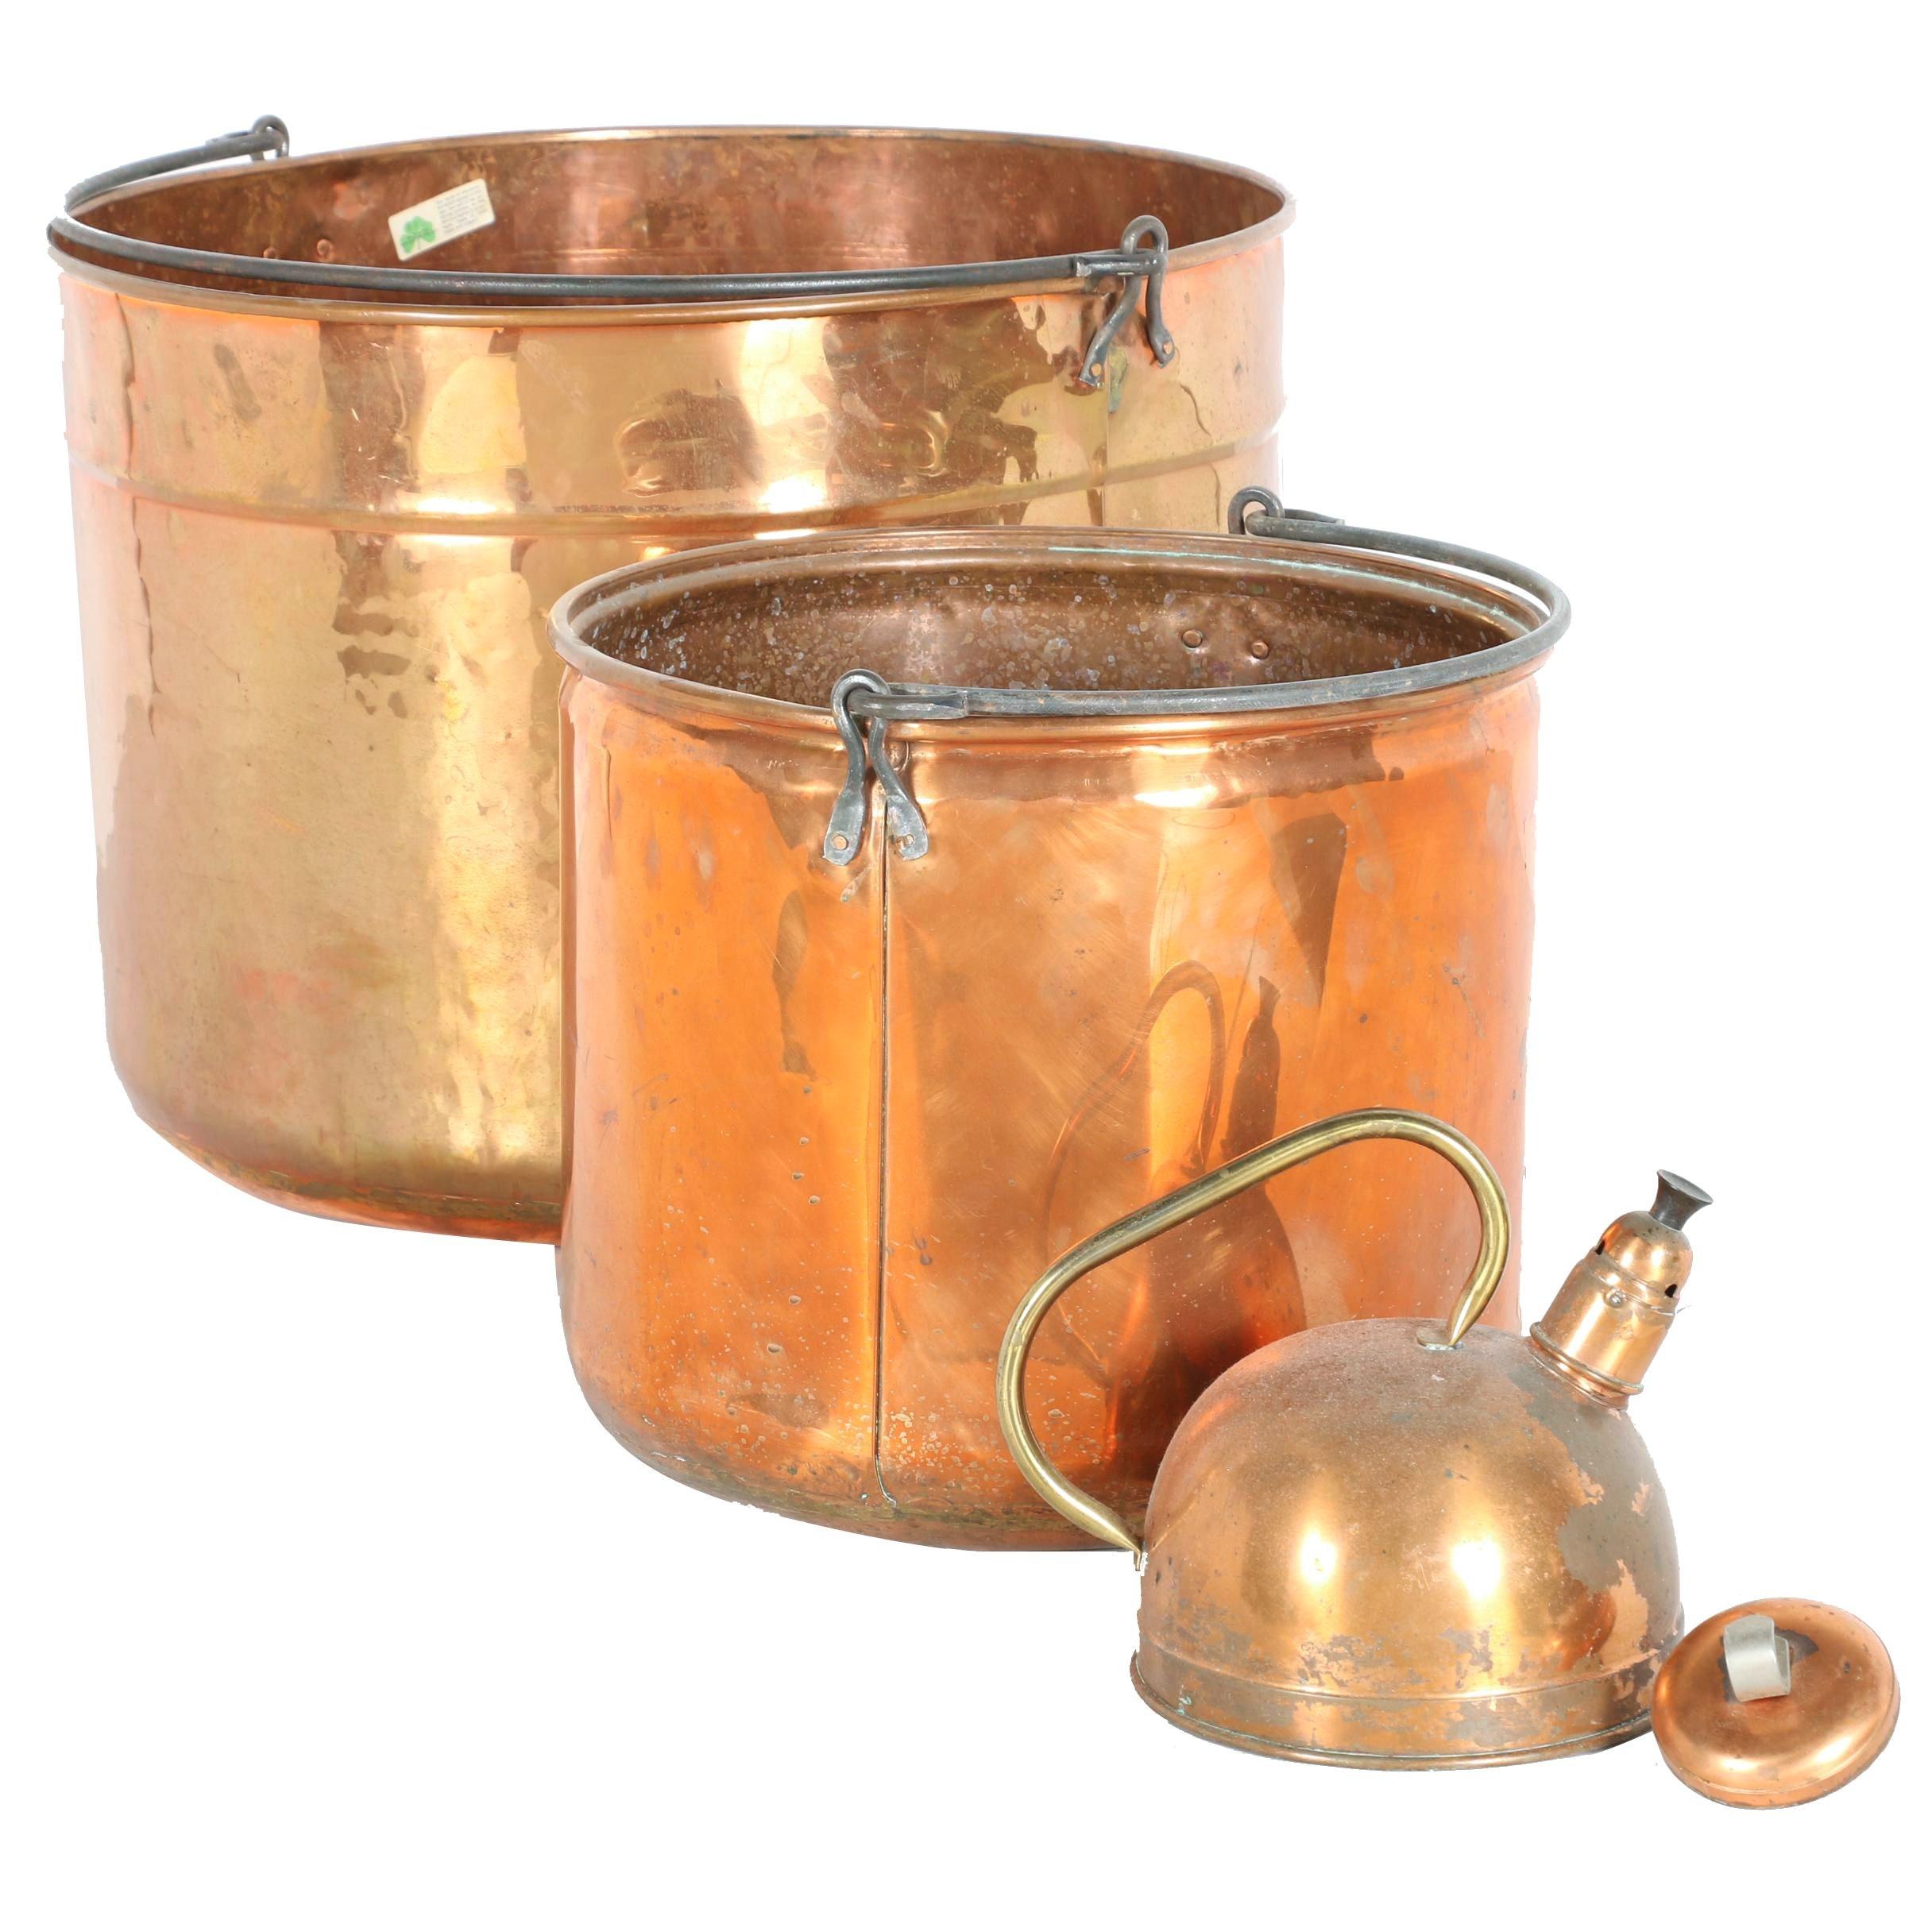 Copper Pots and Tea Kettle